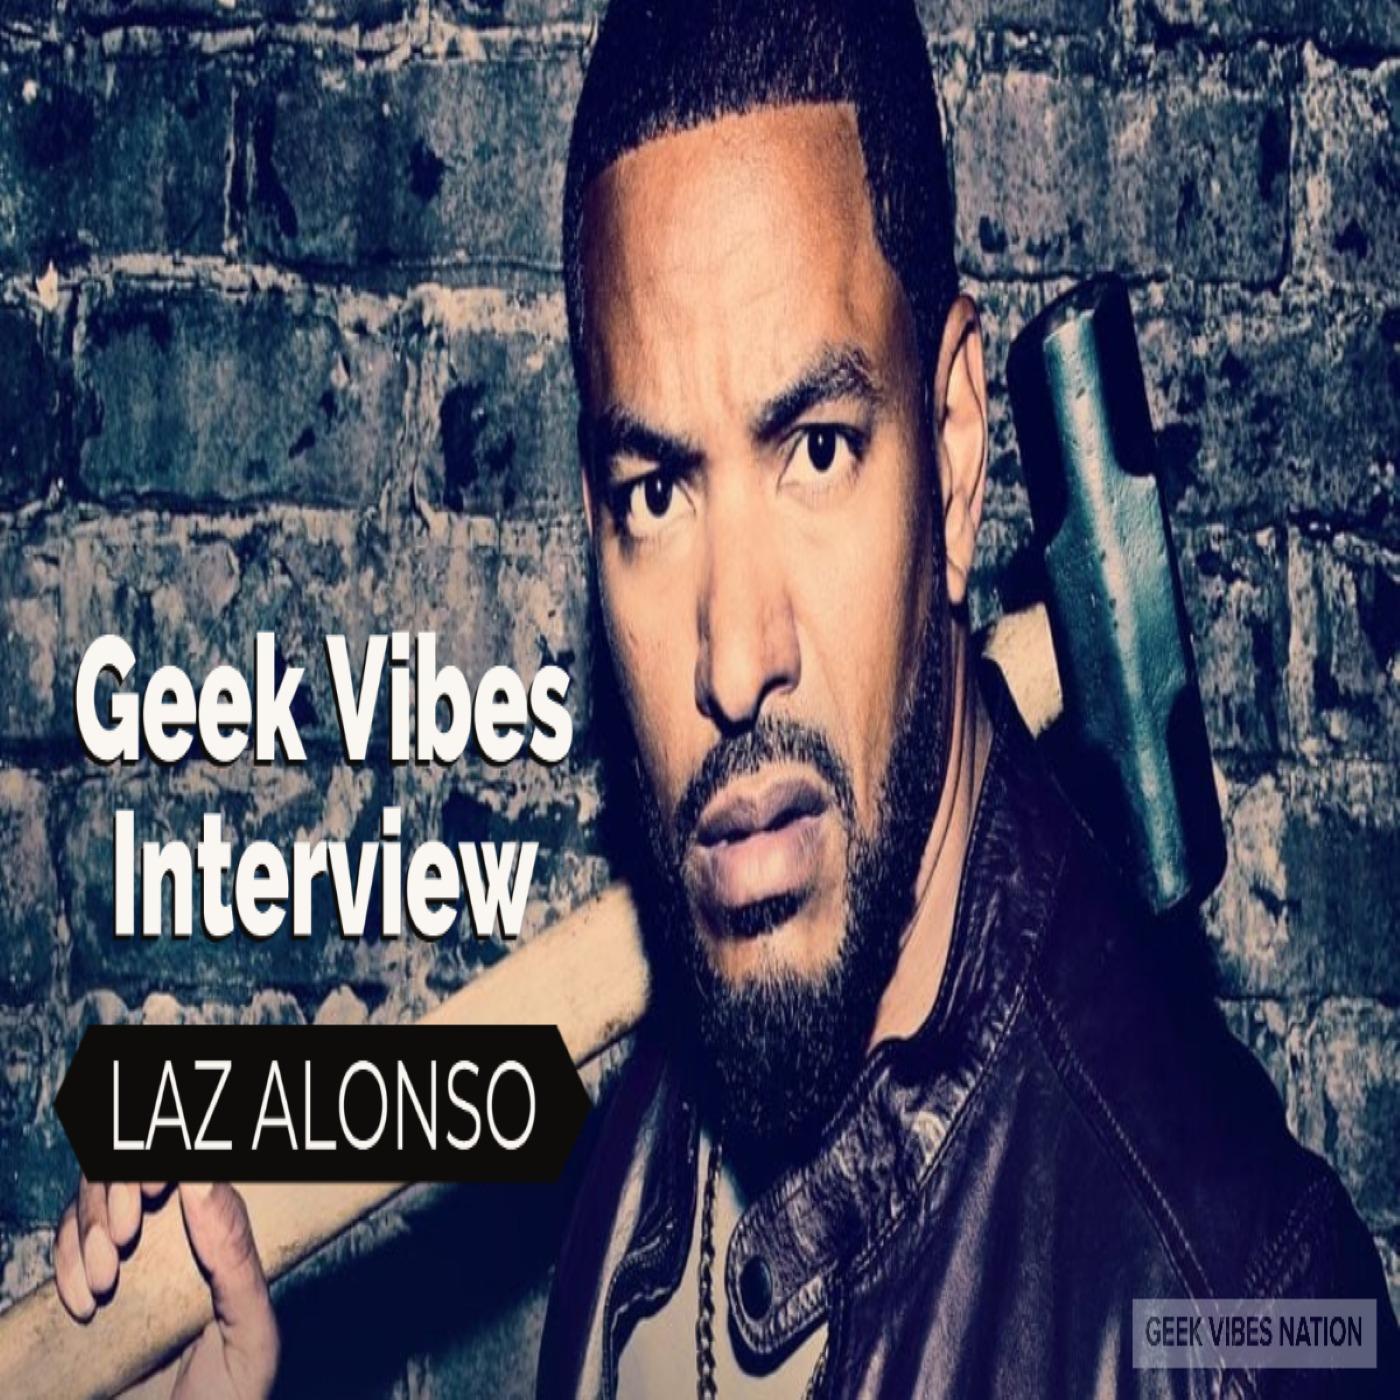 Geek Vibes Interview w/ Laz Alonso